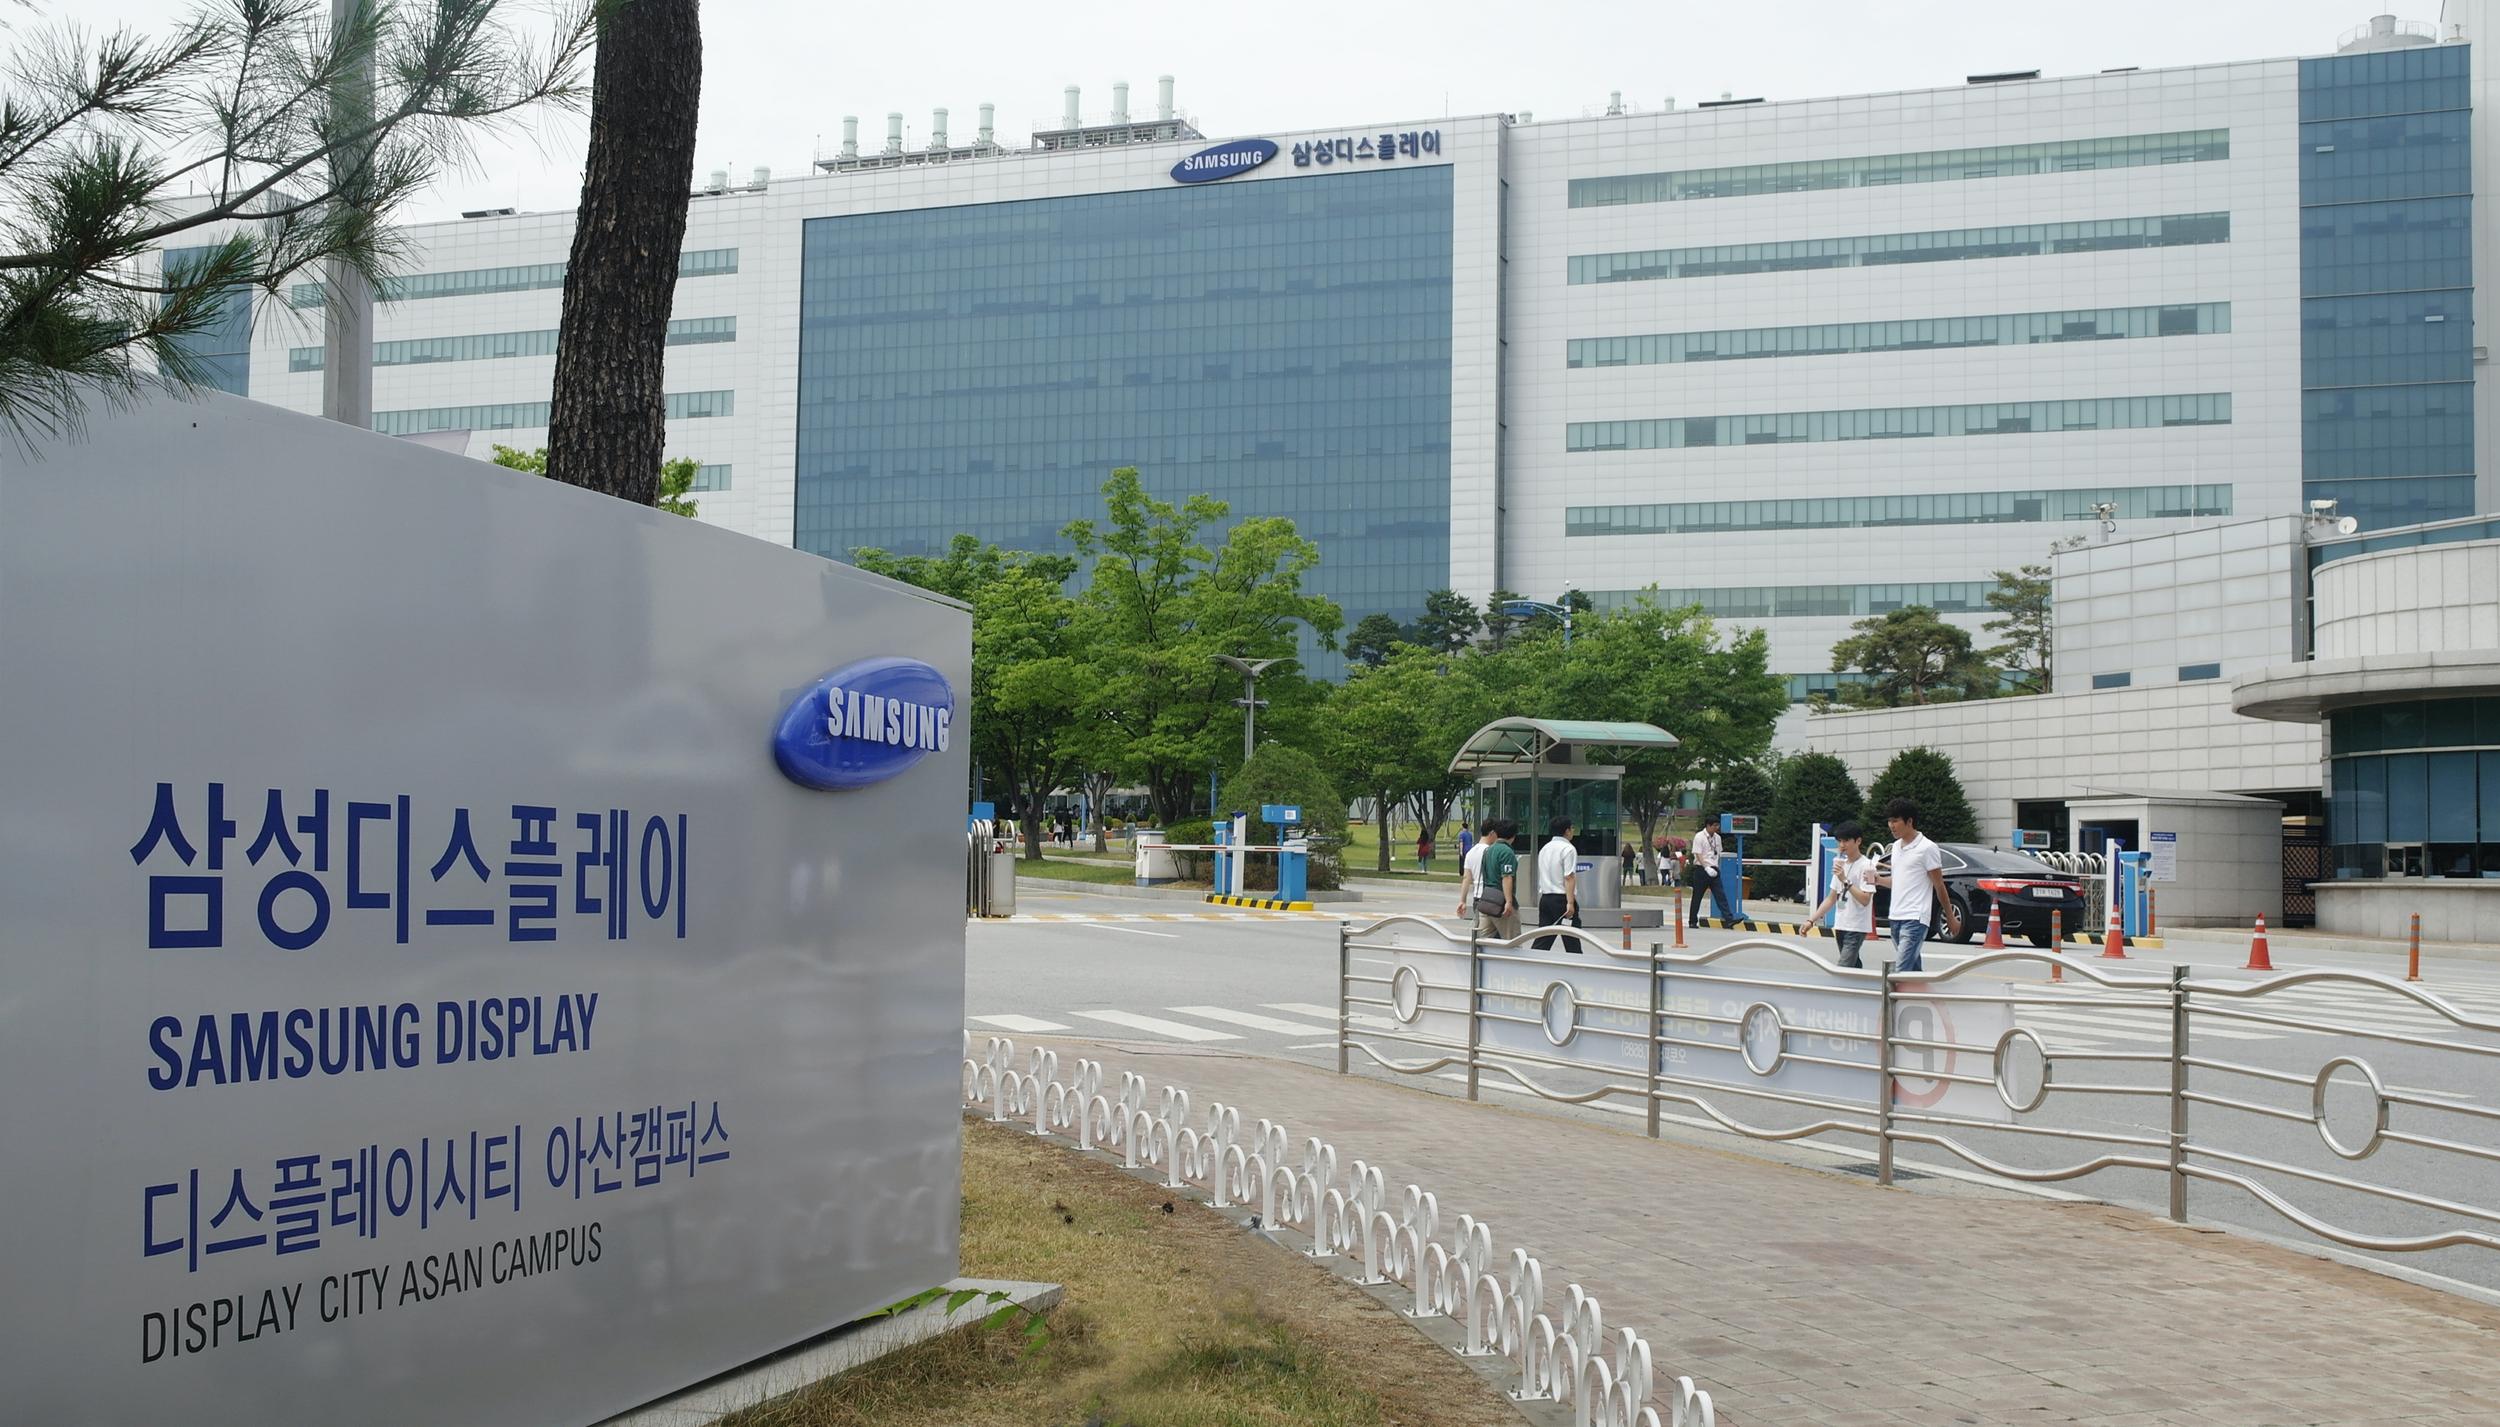 Samsung Display Asan Campus, Chungnam, South Korea where the Quantum Dot display fab will be built.